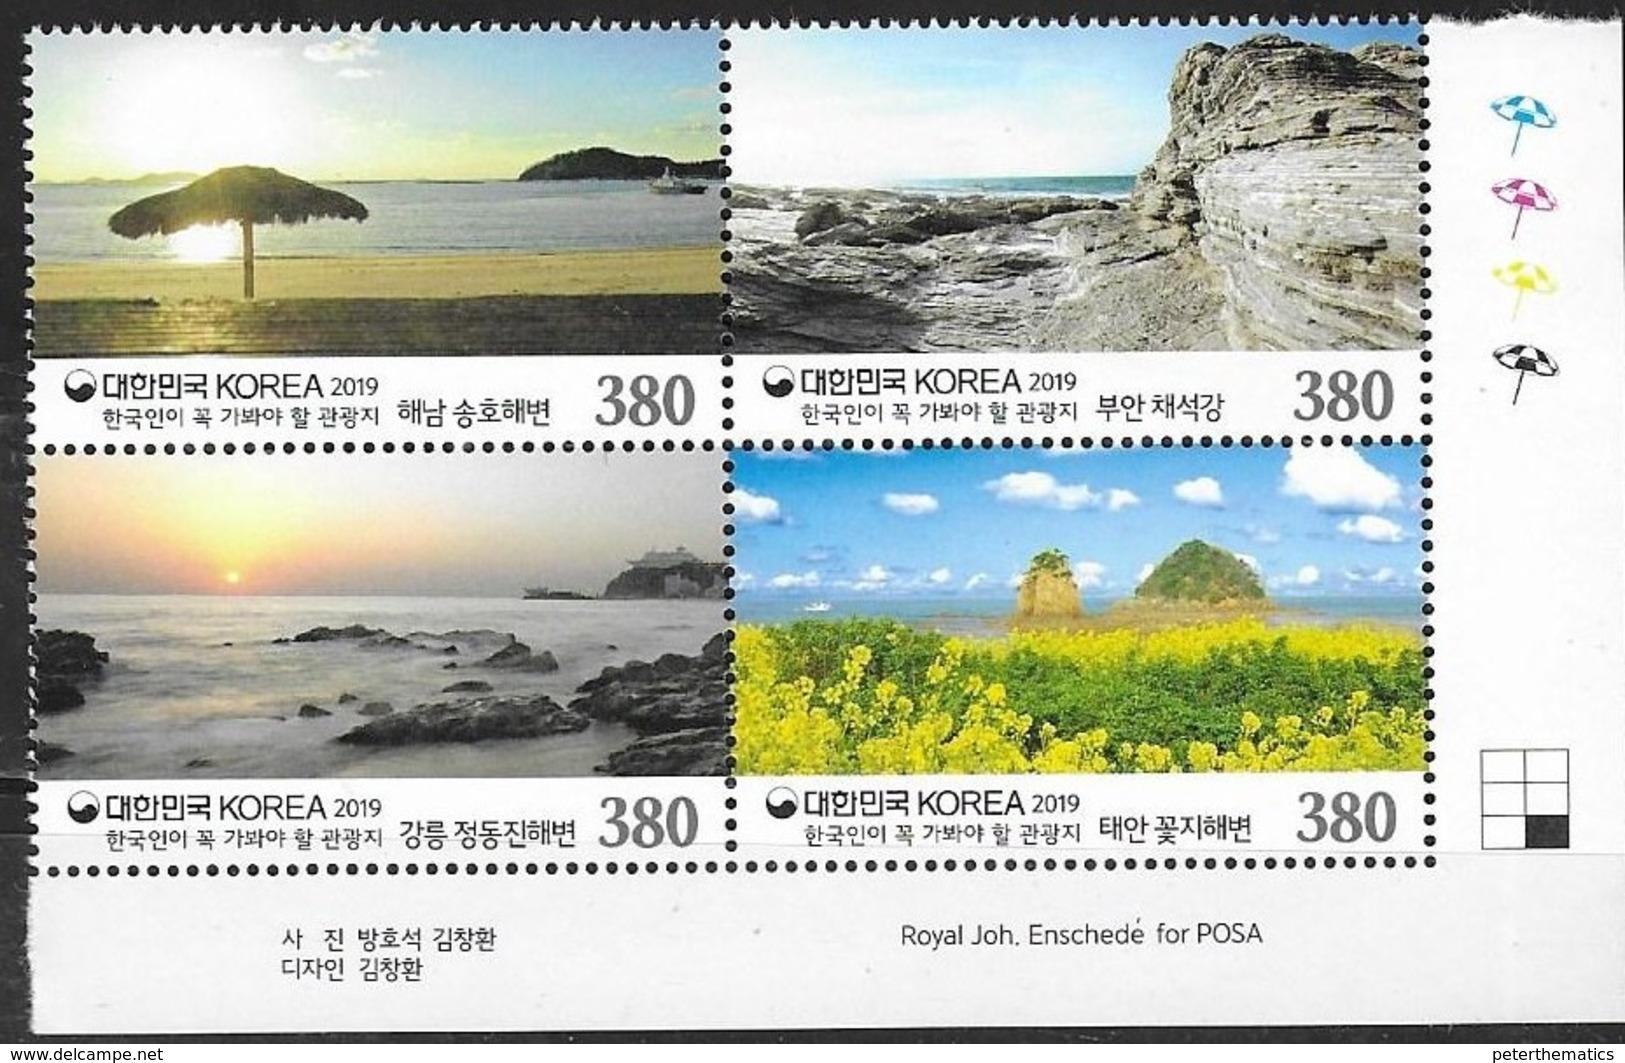 SOUTH KOREA, 2019, MNH, TOURISM, BEACHES, BOATS, LANDSCAPES, 4v - Vakantie & Toerisme